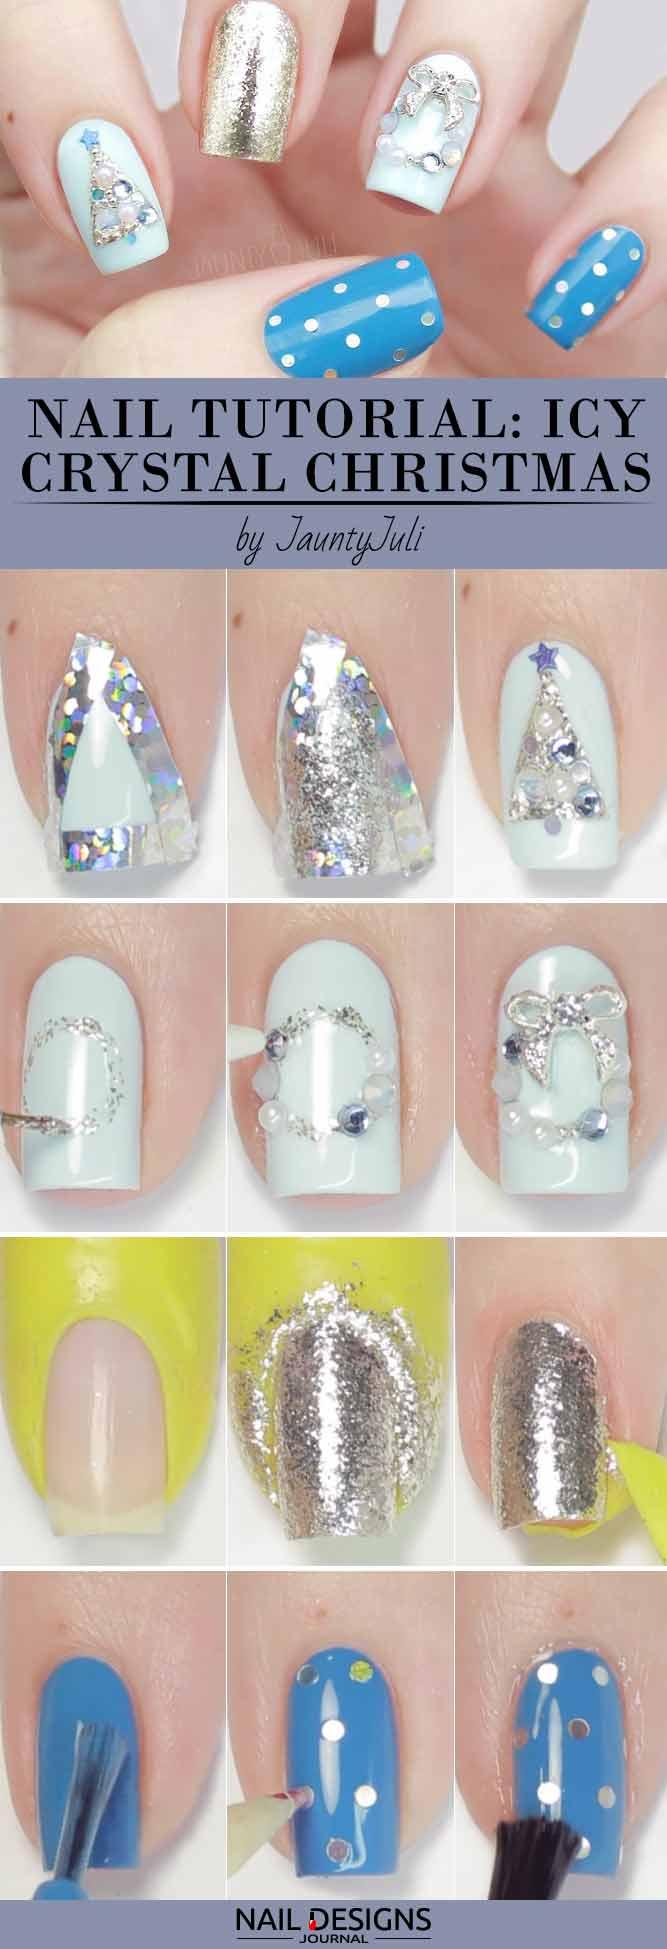 Icy Crystal Christmas Design